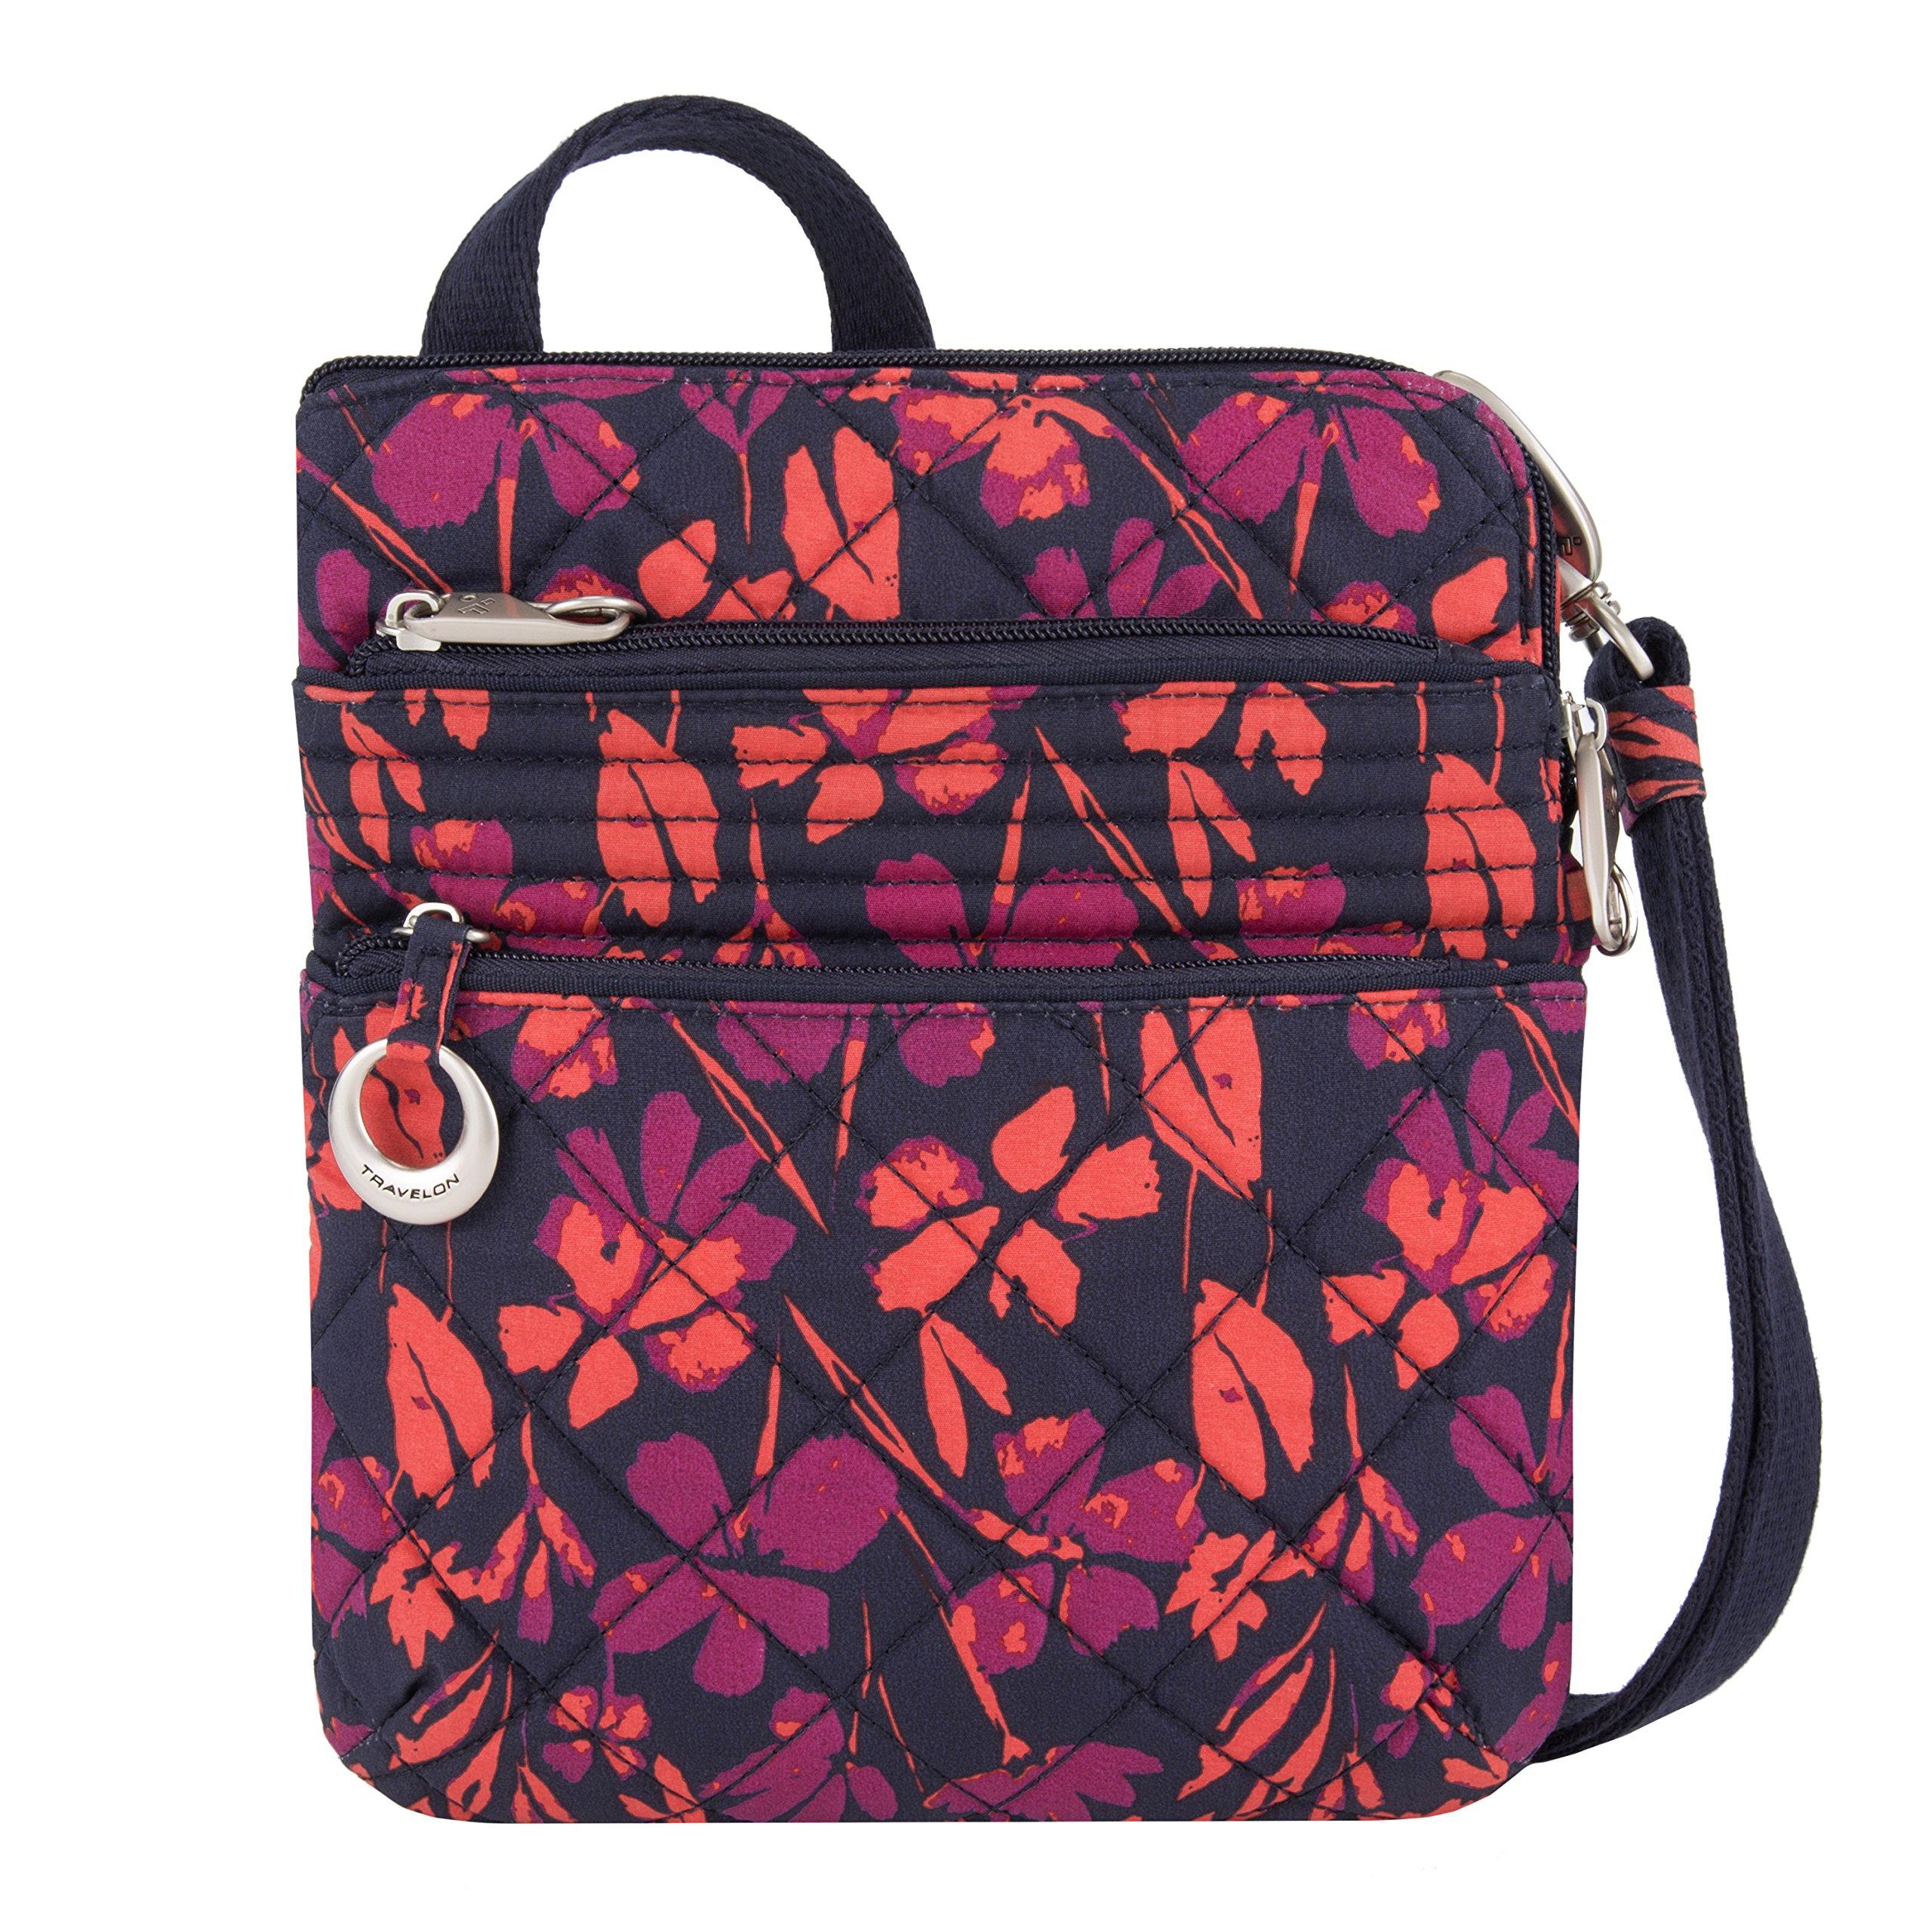 Travelon Women's Anti-theft Boho Slim Bag, Painted Floral